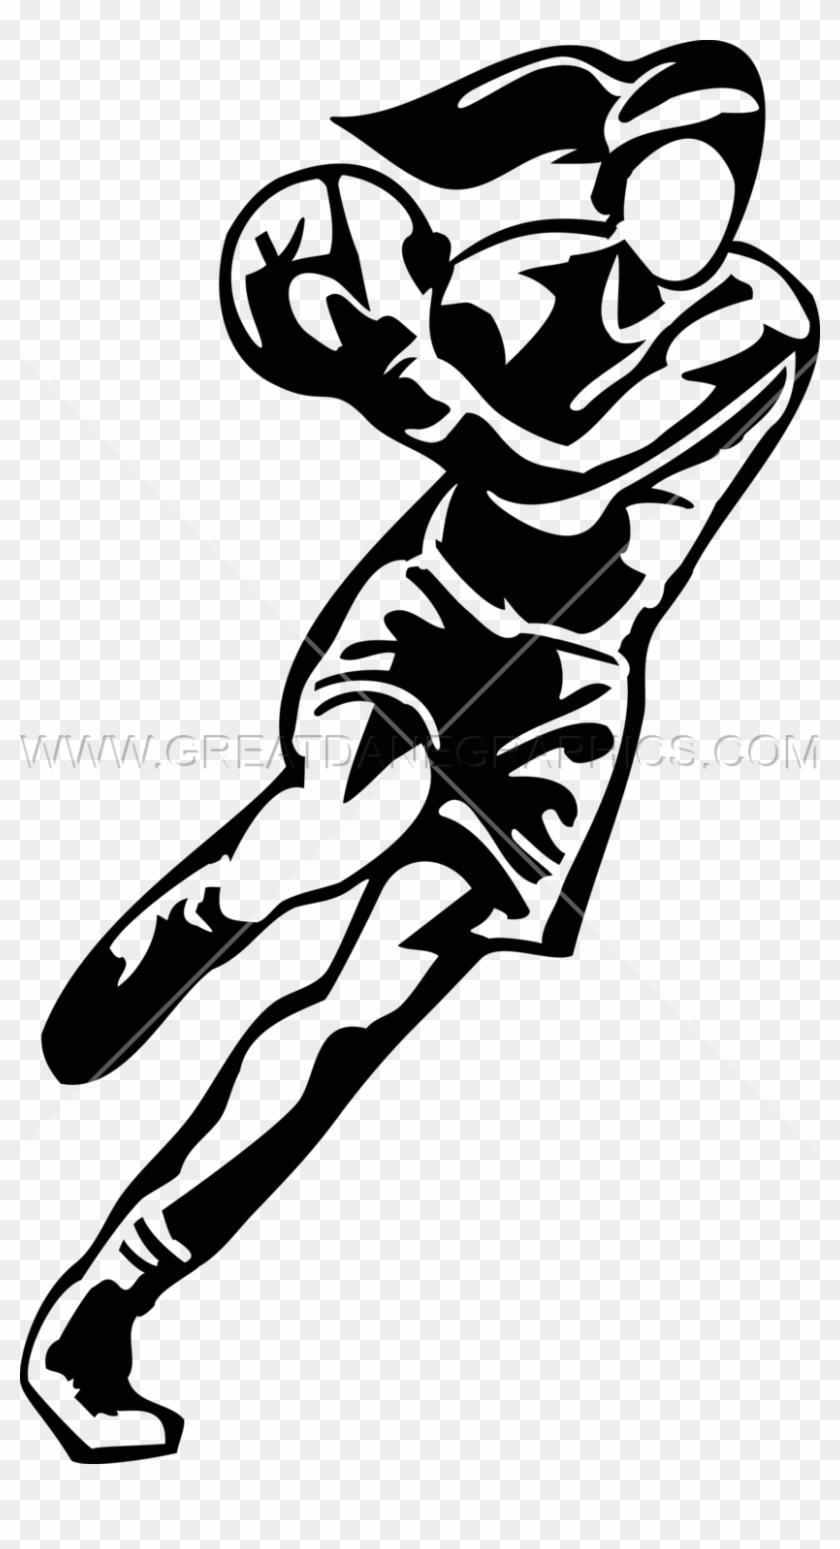 Female Basketball Player - Girls Basketball Clipart Black And White #1451003